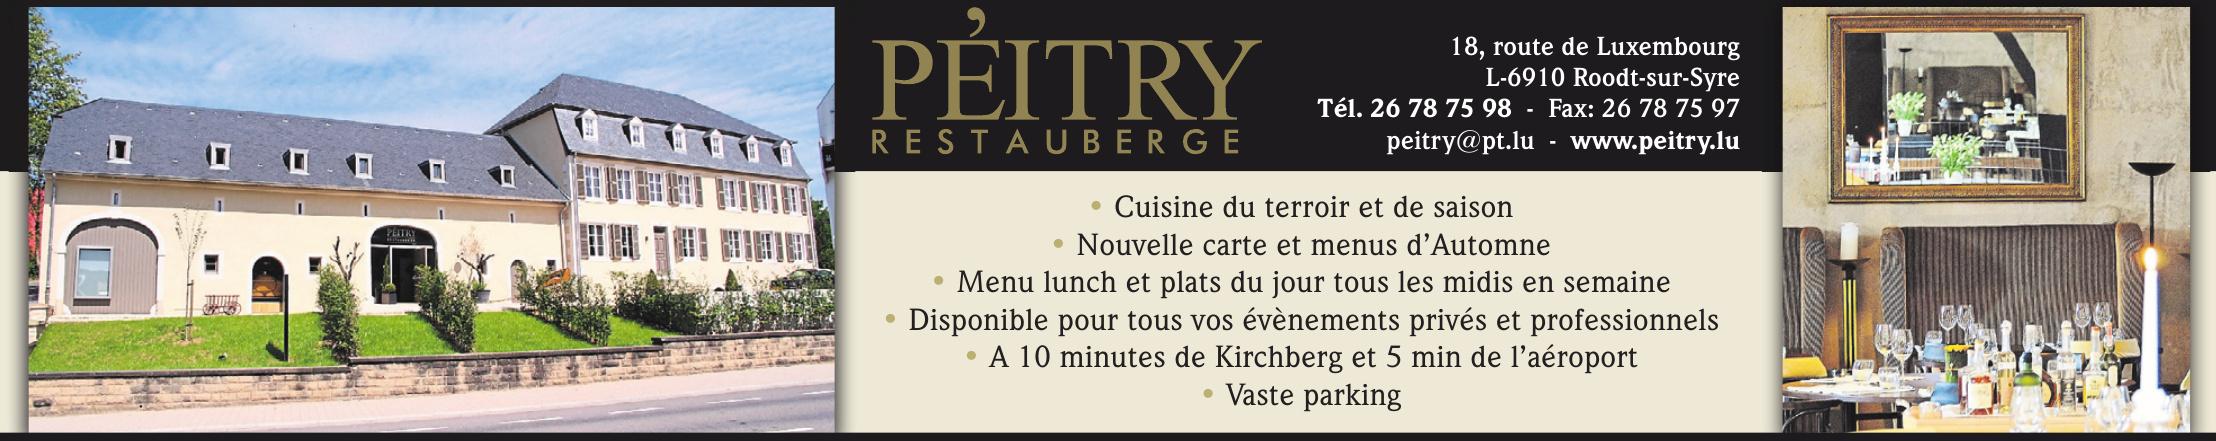 Pèitry Restaurant